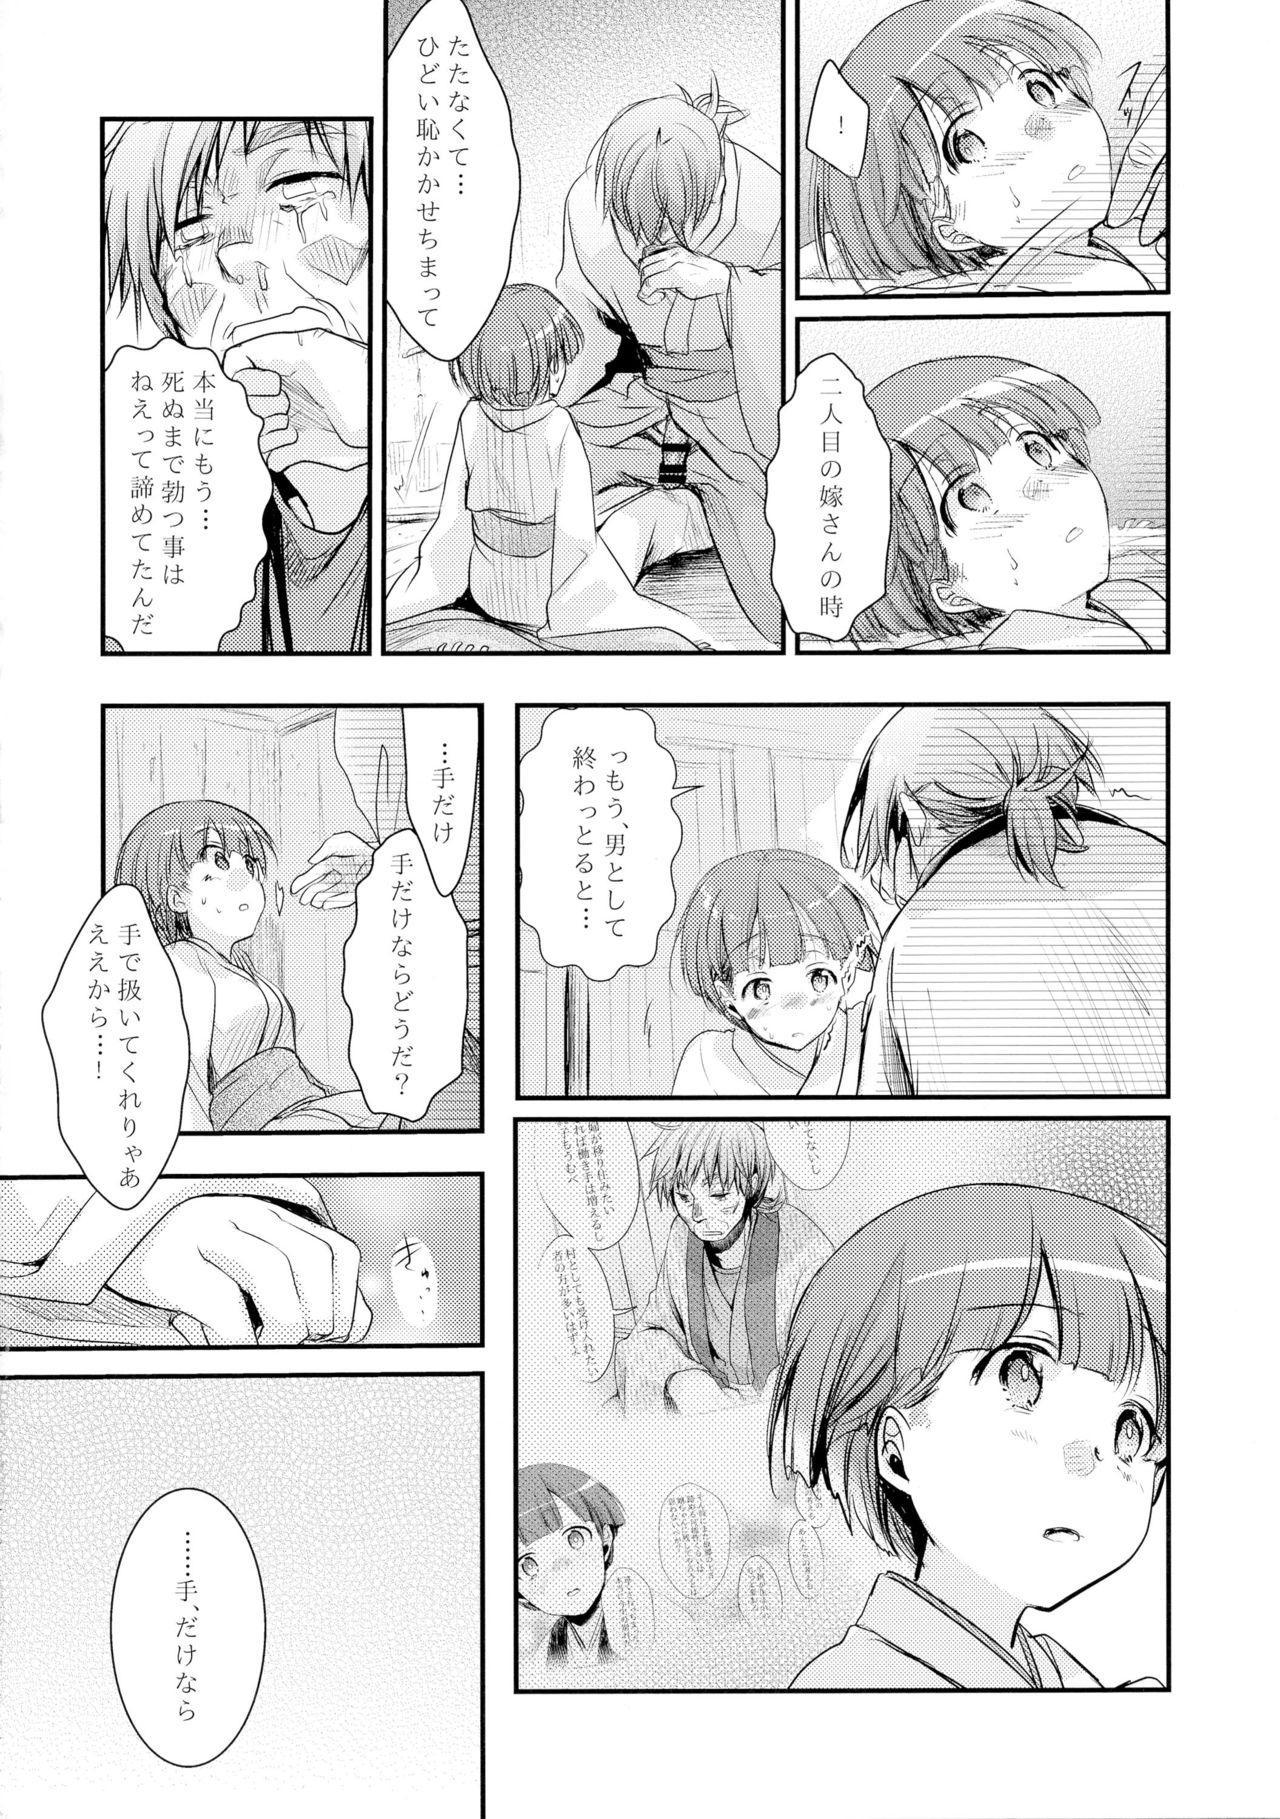 Kakeochi Shoujo Netorare 19